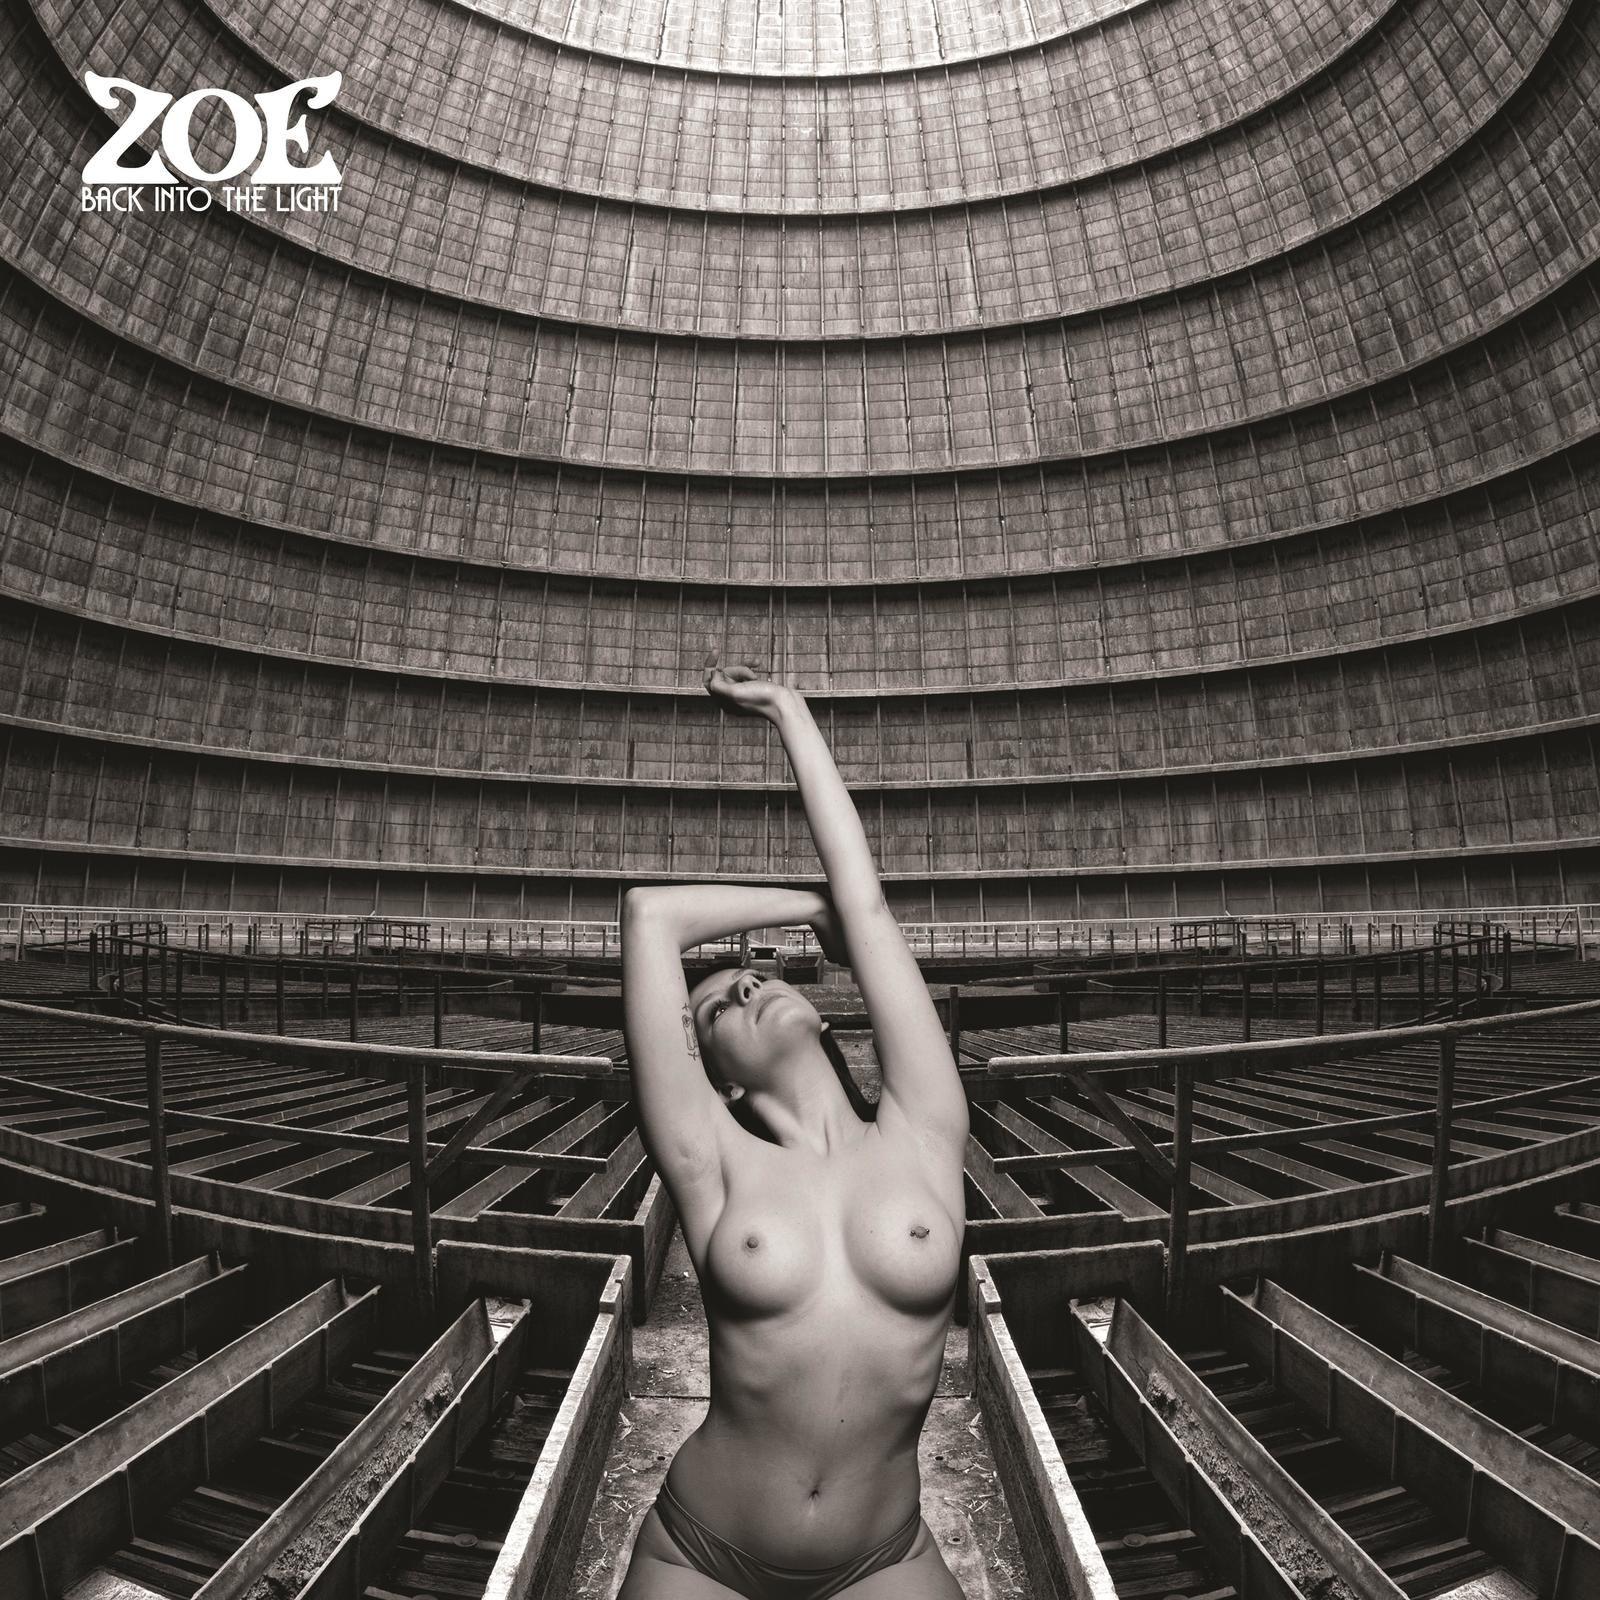 ZOE - Back Into The Light